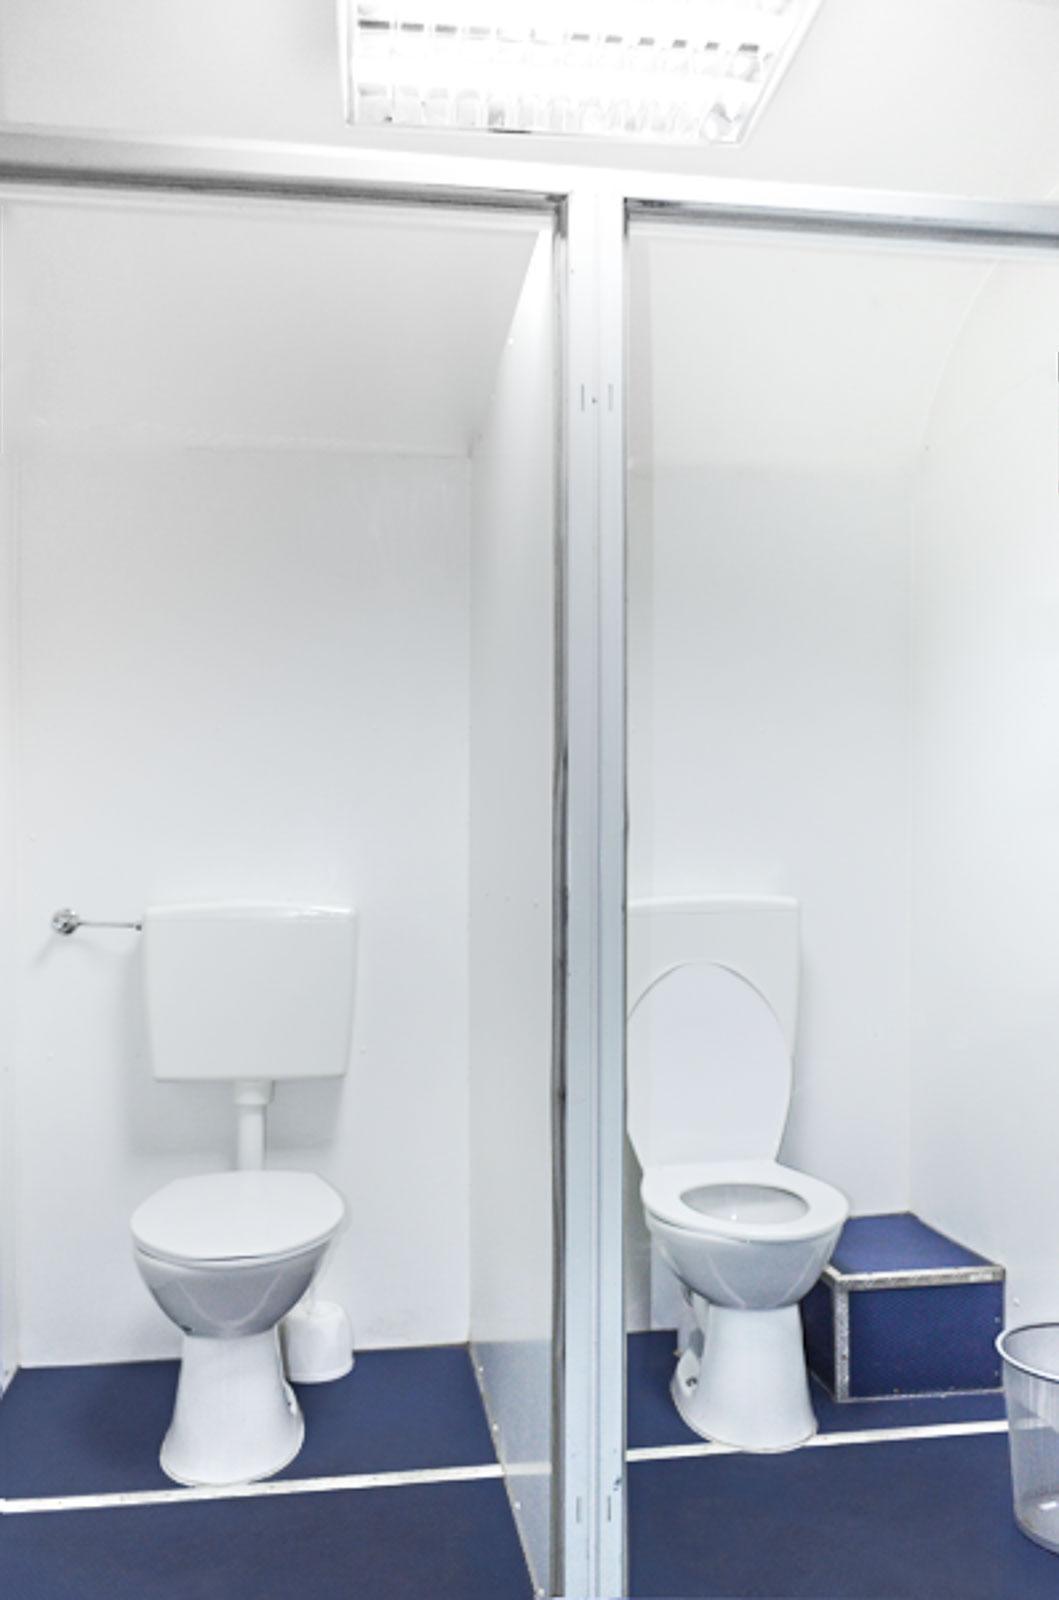 Toiletten Vermietung Aachen - Toilettenwagen Frauentoiletten